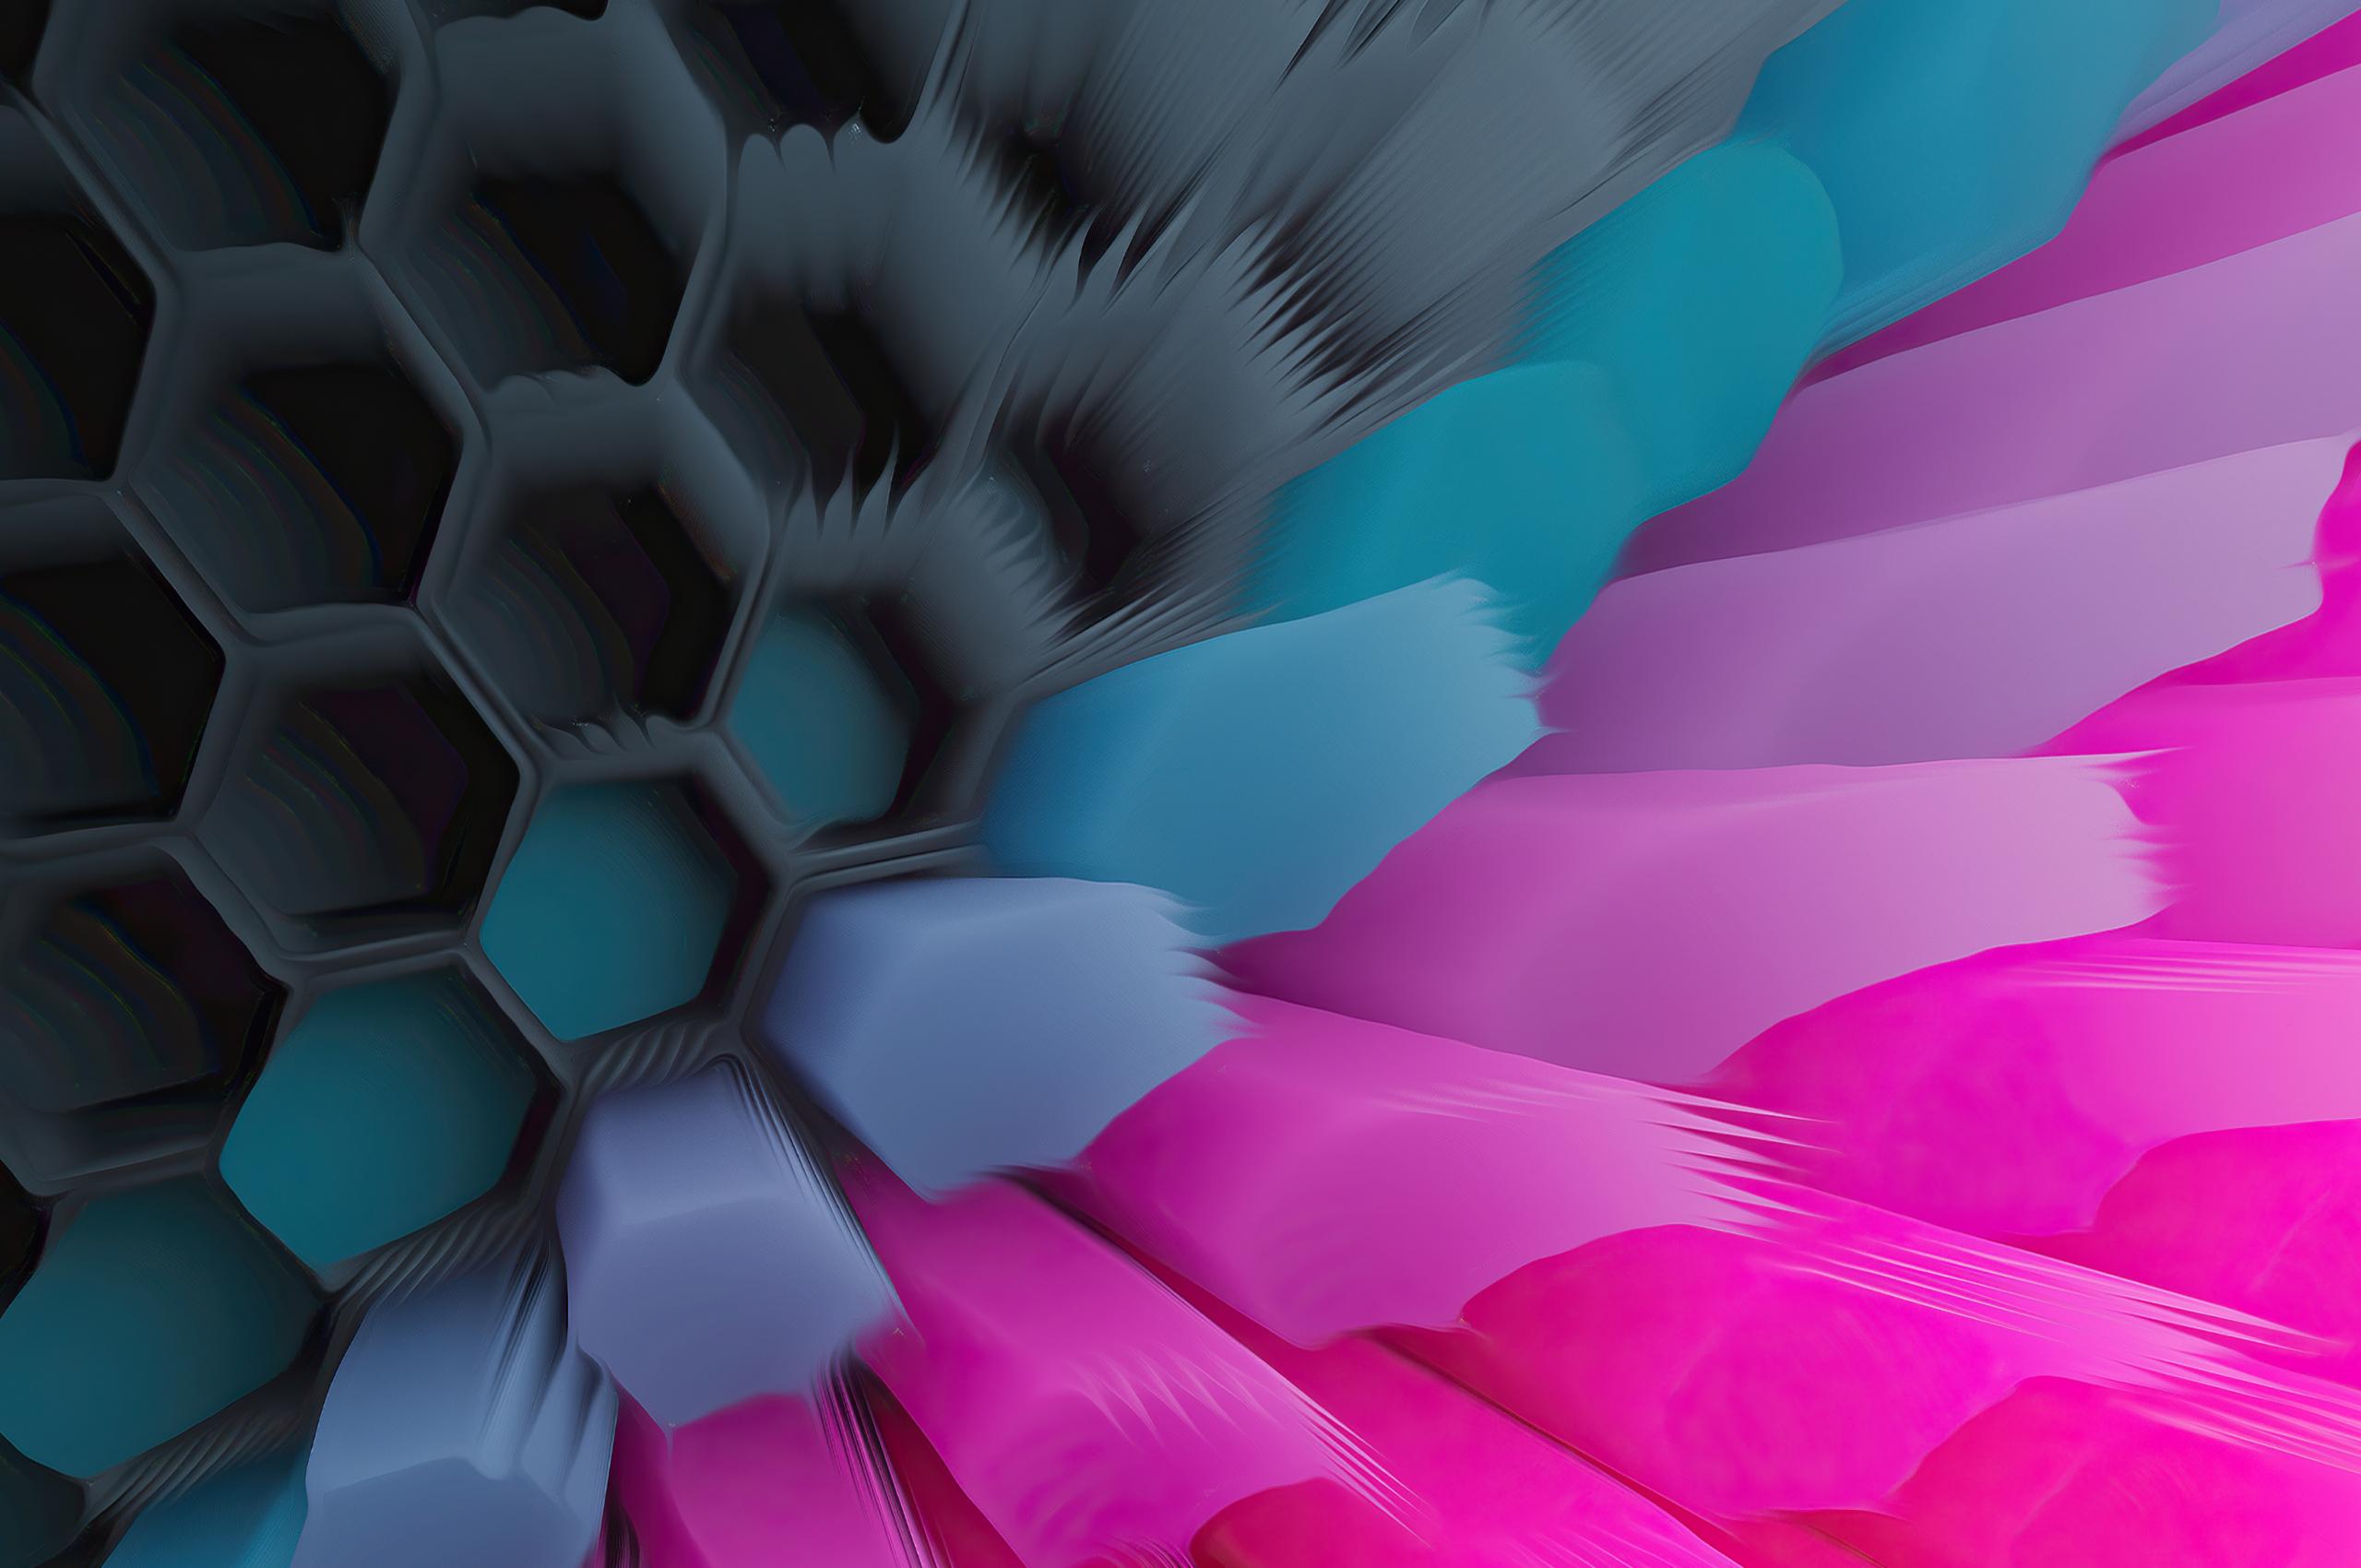 Pink Blue 4K Hexagon Wallpaper in 2560x1700 Resolution